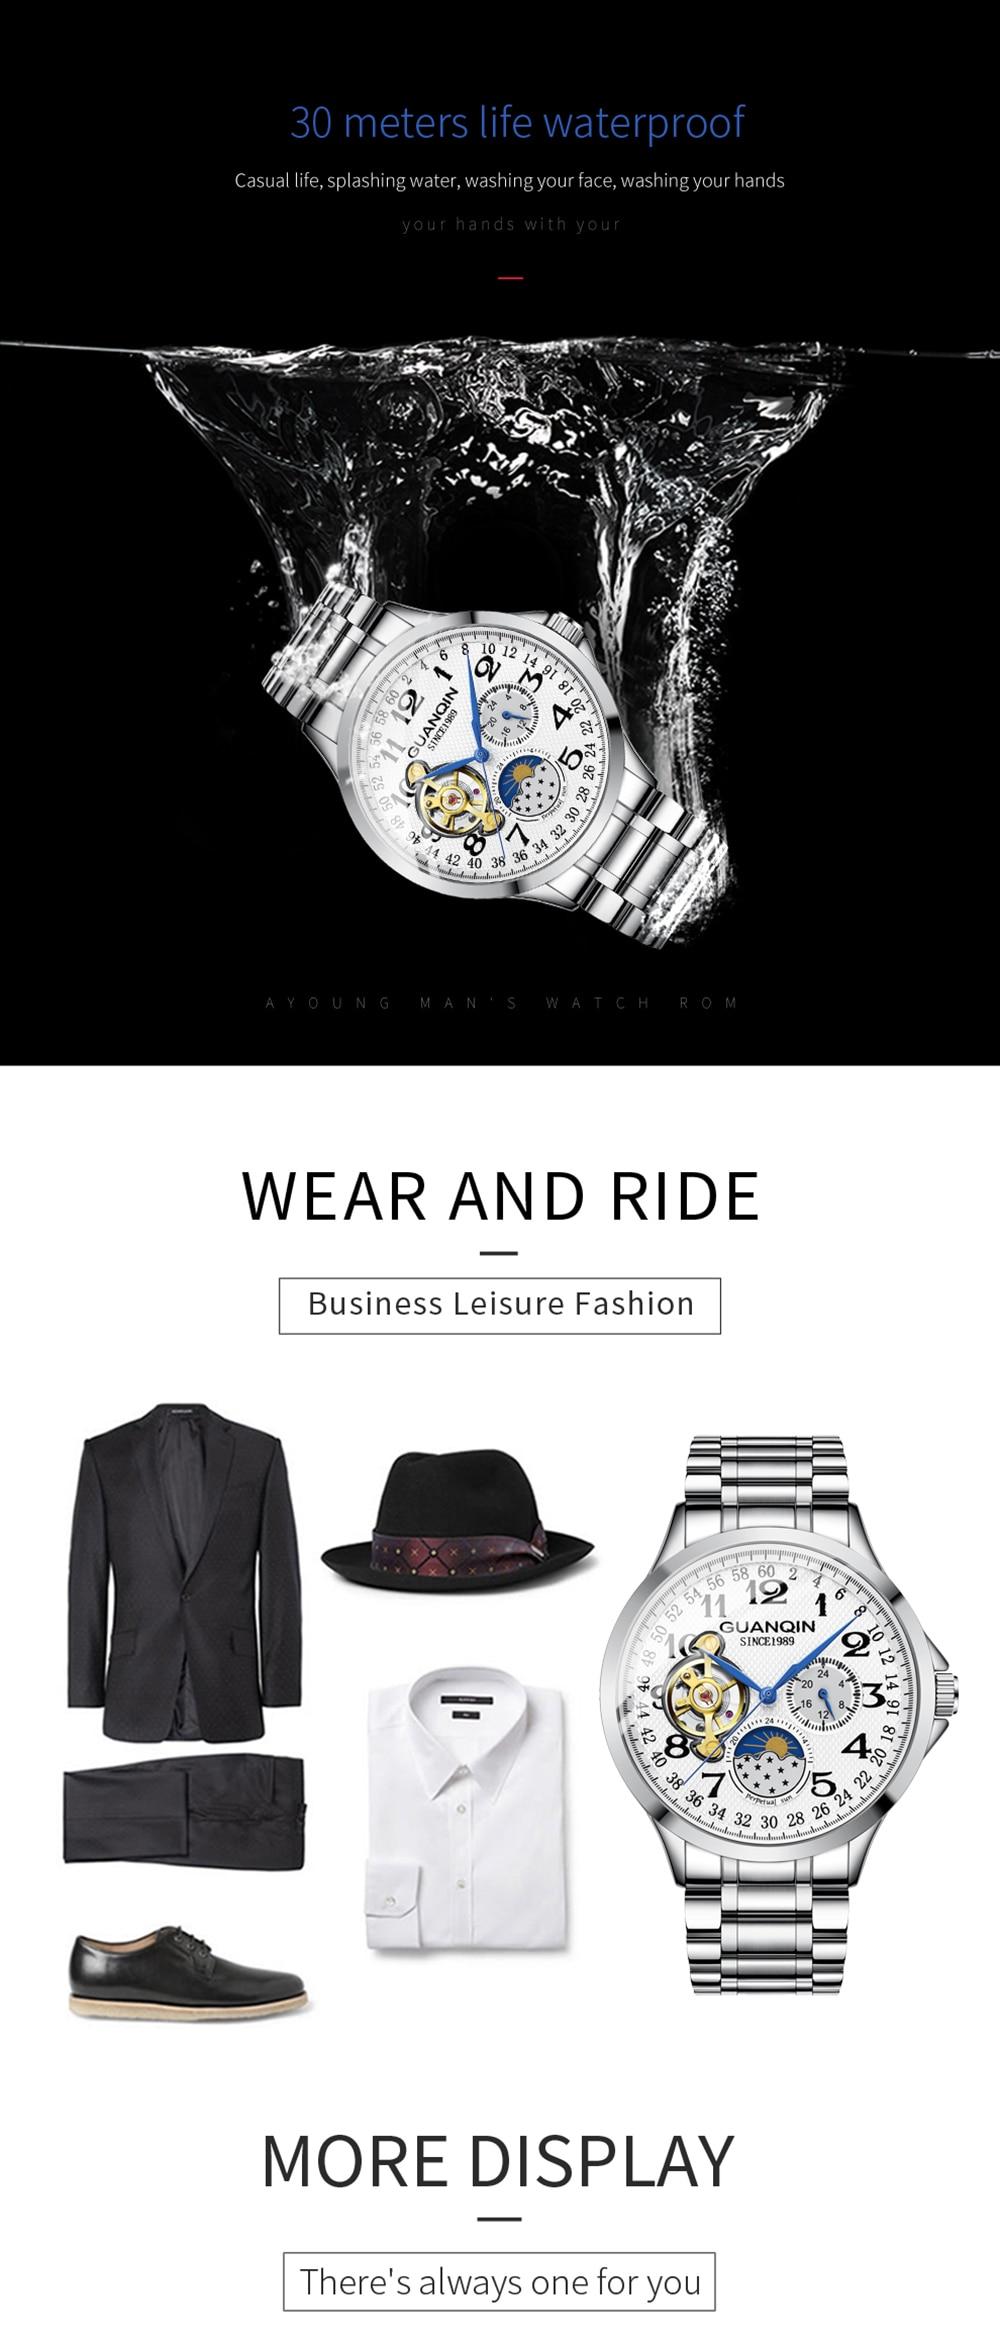 HTB13bmyalKw3KVjSZFOq6yrDVXa5 2019 Fashion GUANQIN Mens Watches Top Brand Luxury Skeleton Watch Men Sport Leather Tourbillon Automatic Mechanical Wristwatch